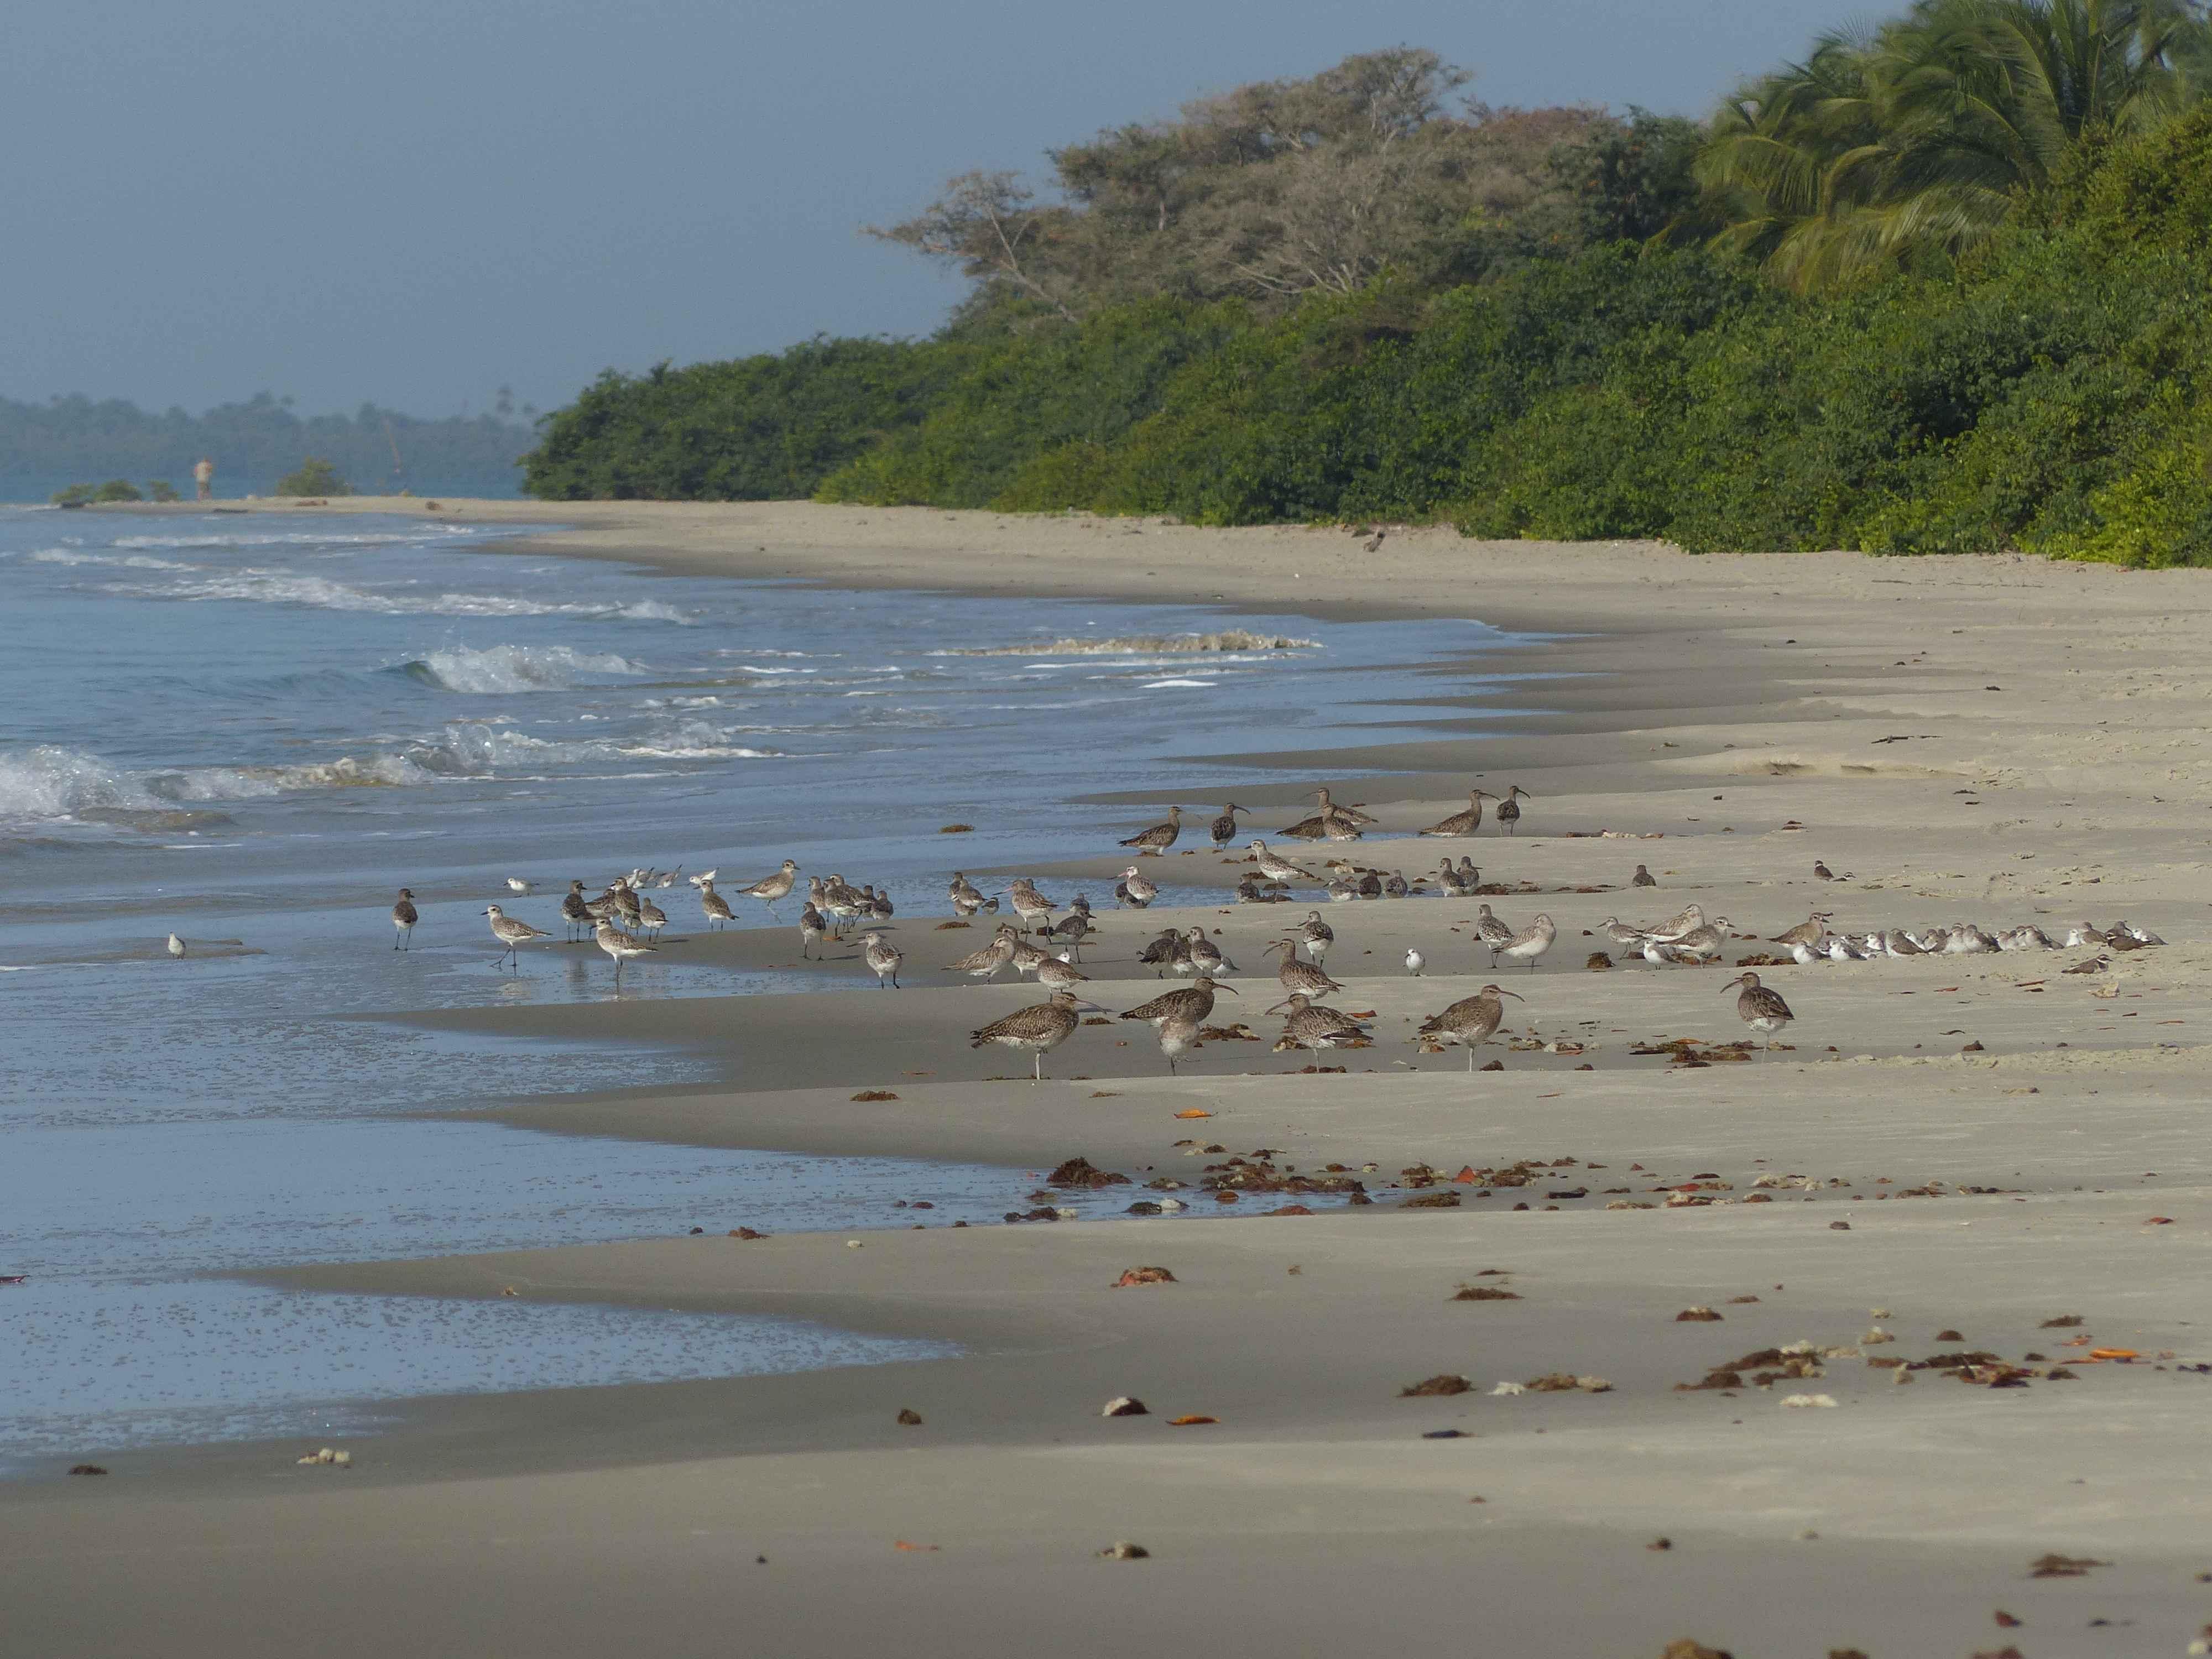 Roosting_shorebirds_Guinea_Bissau